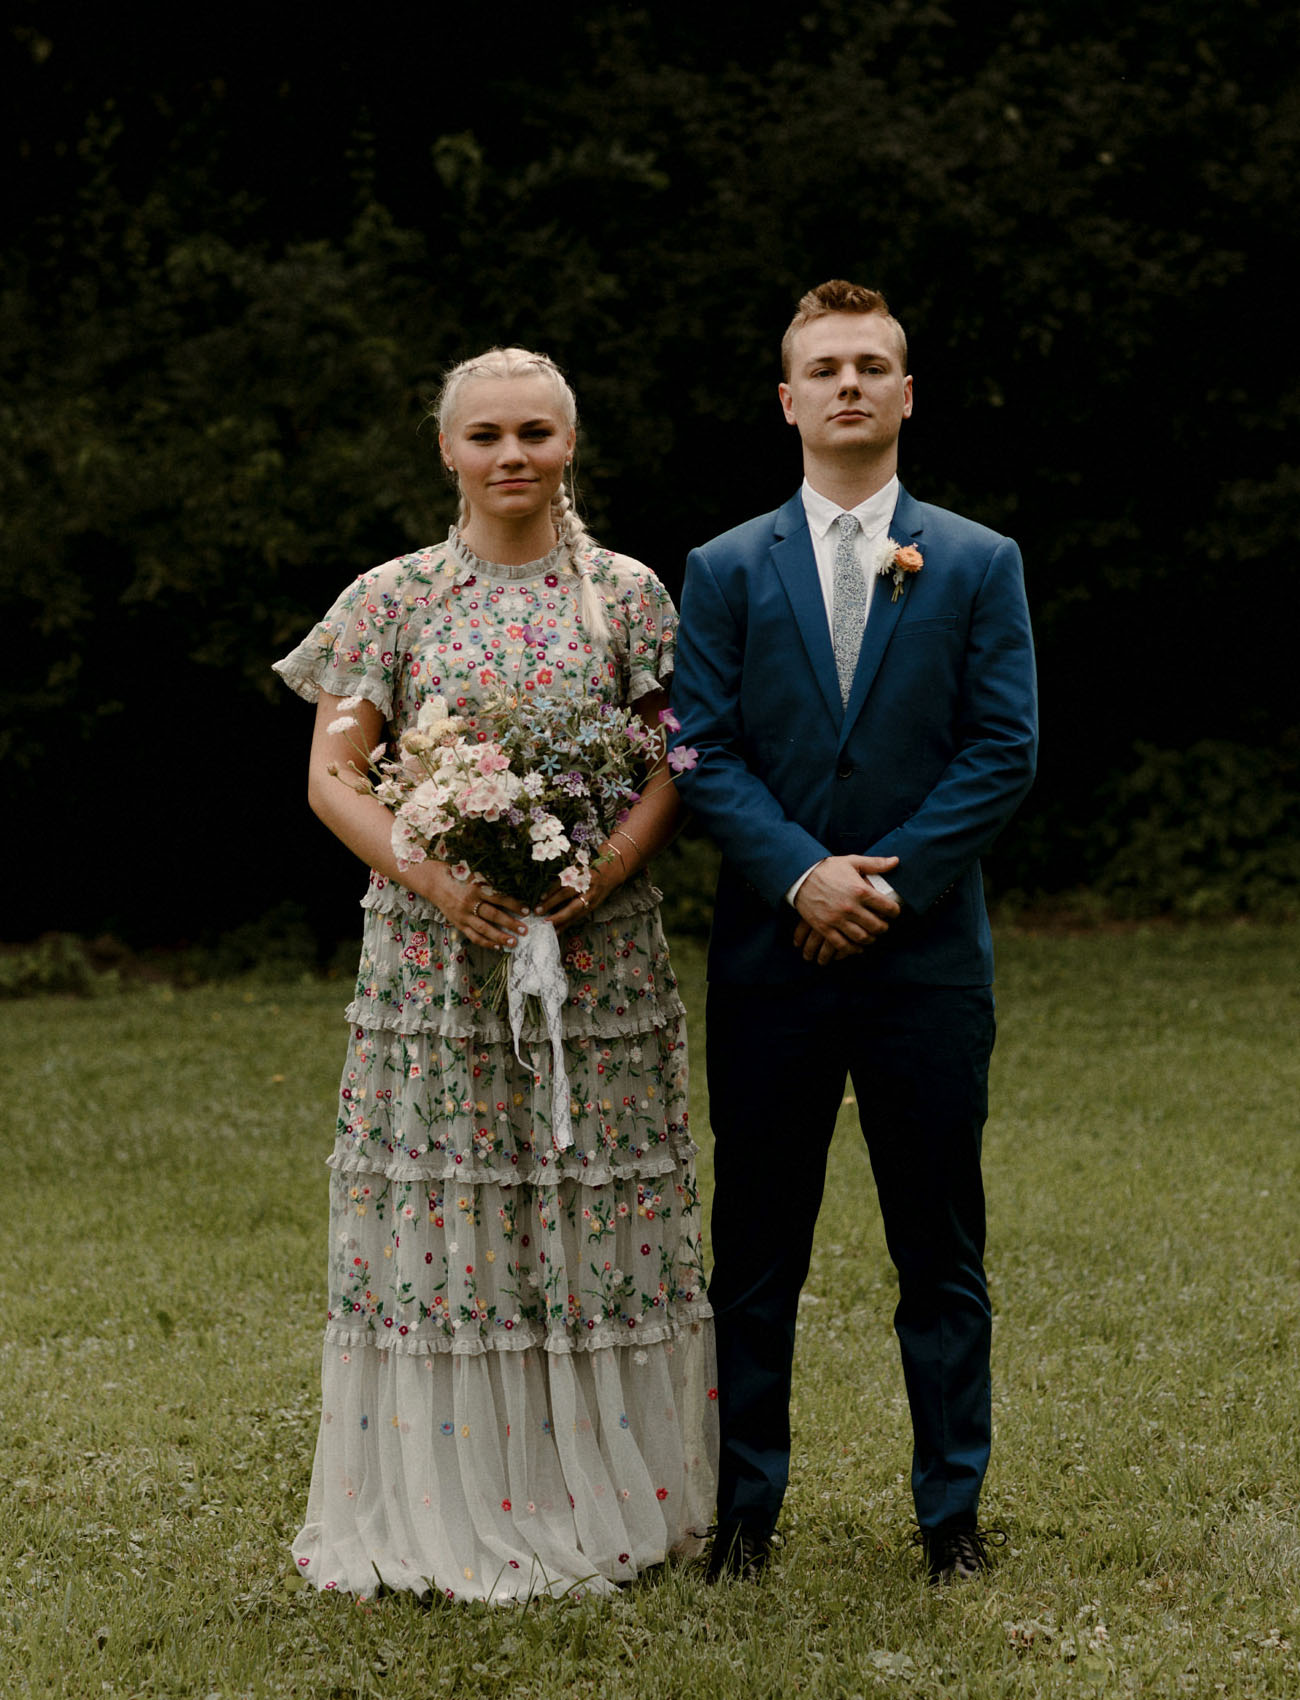 minnesota-wedding-01.jpg